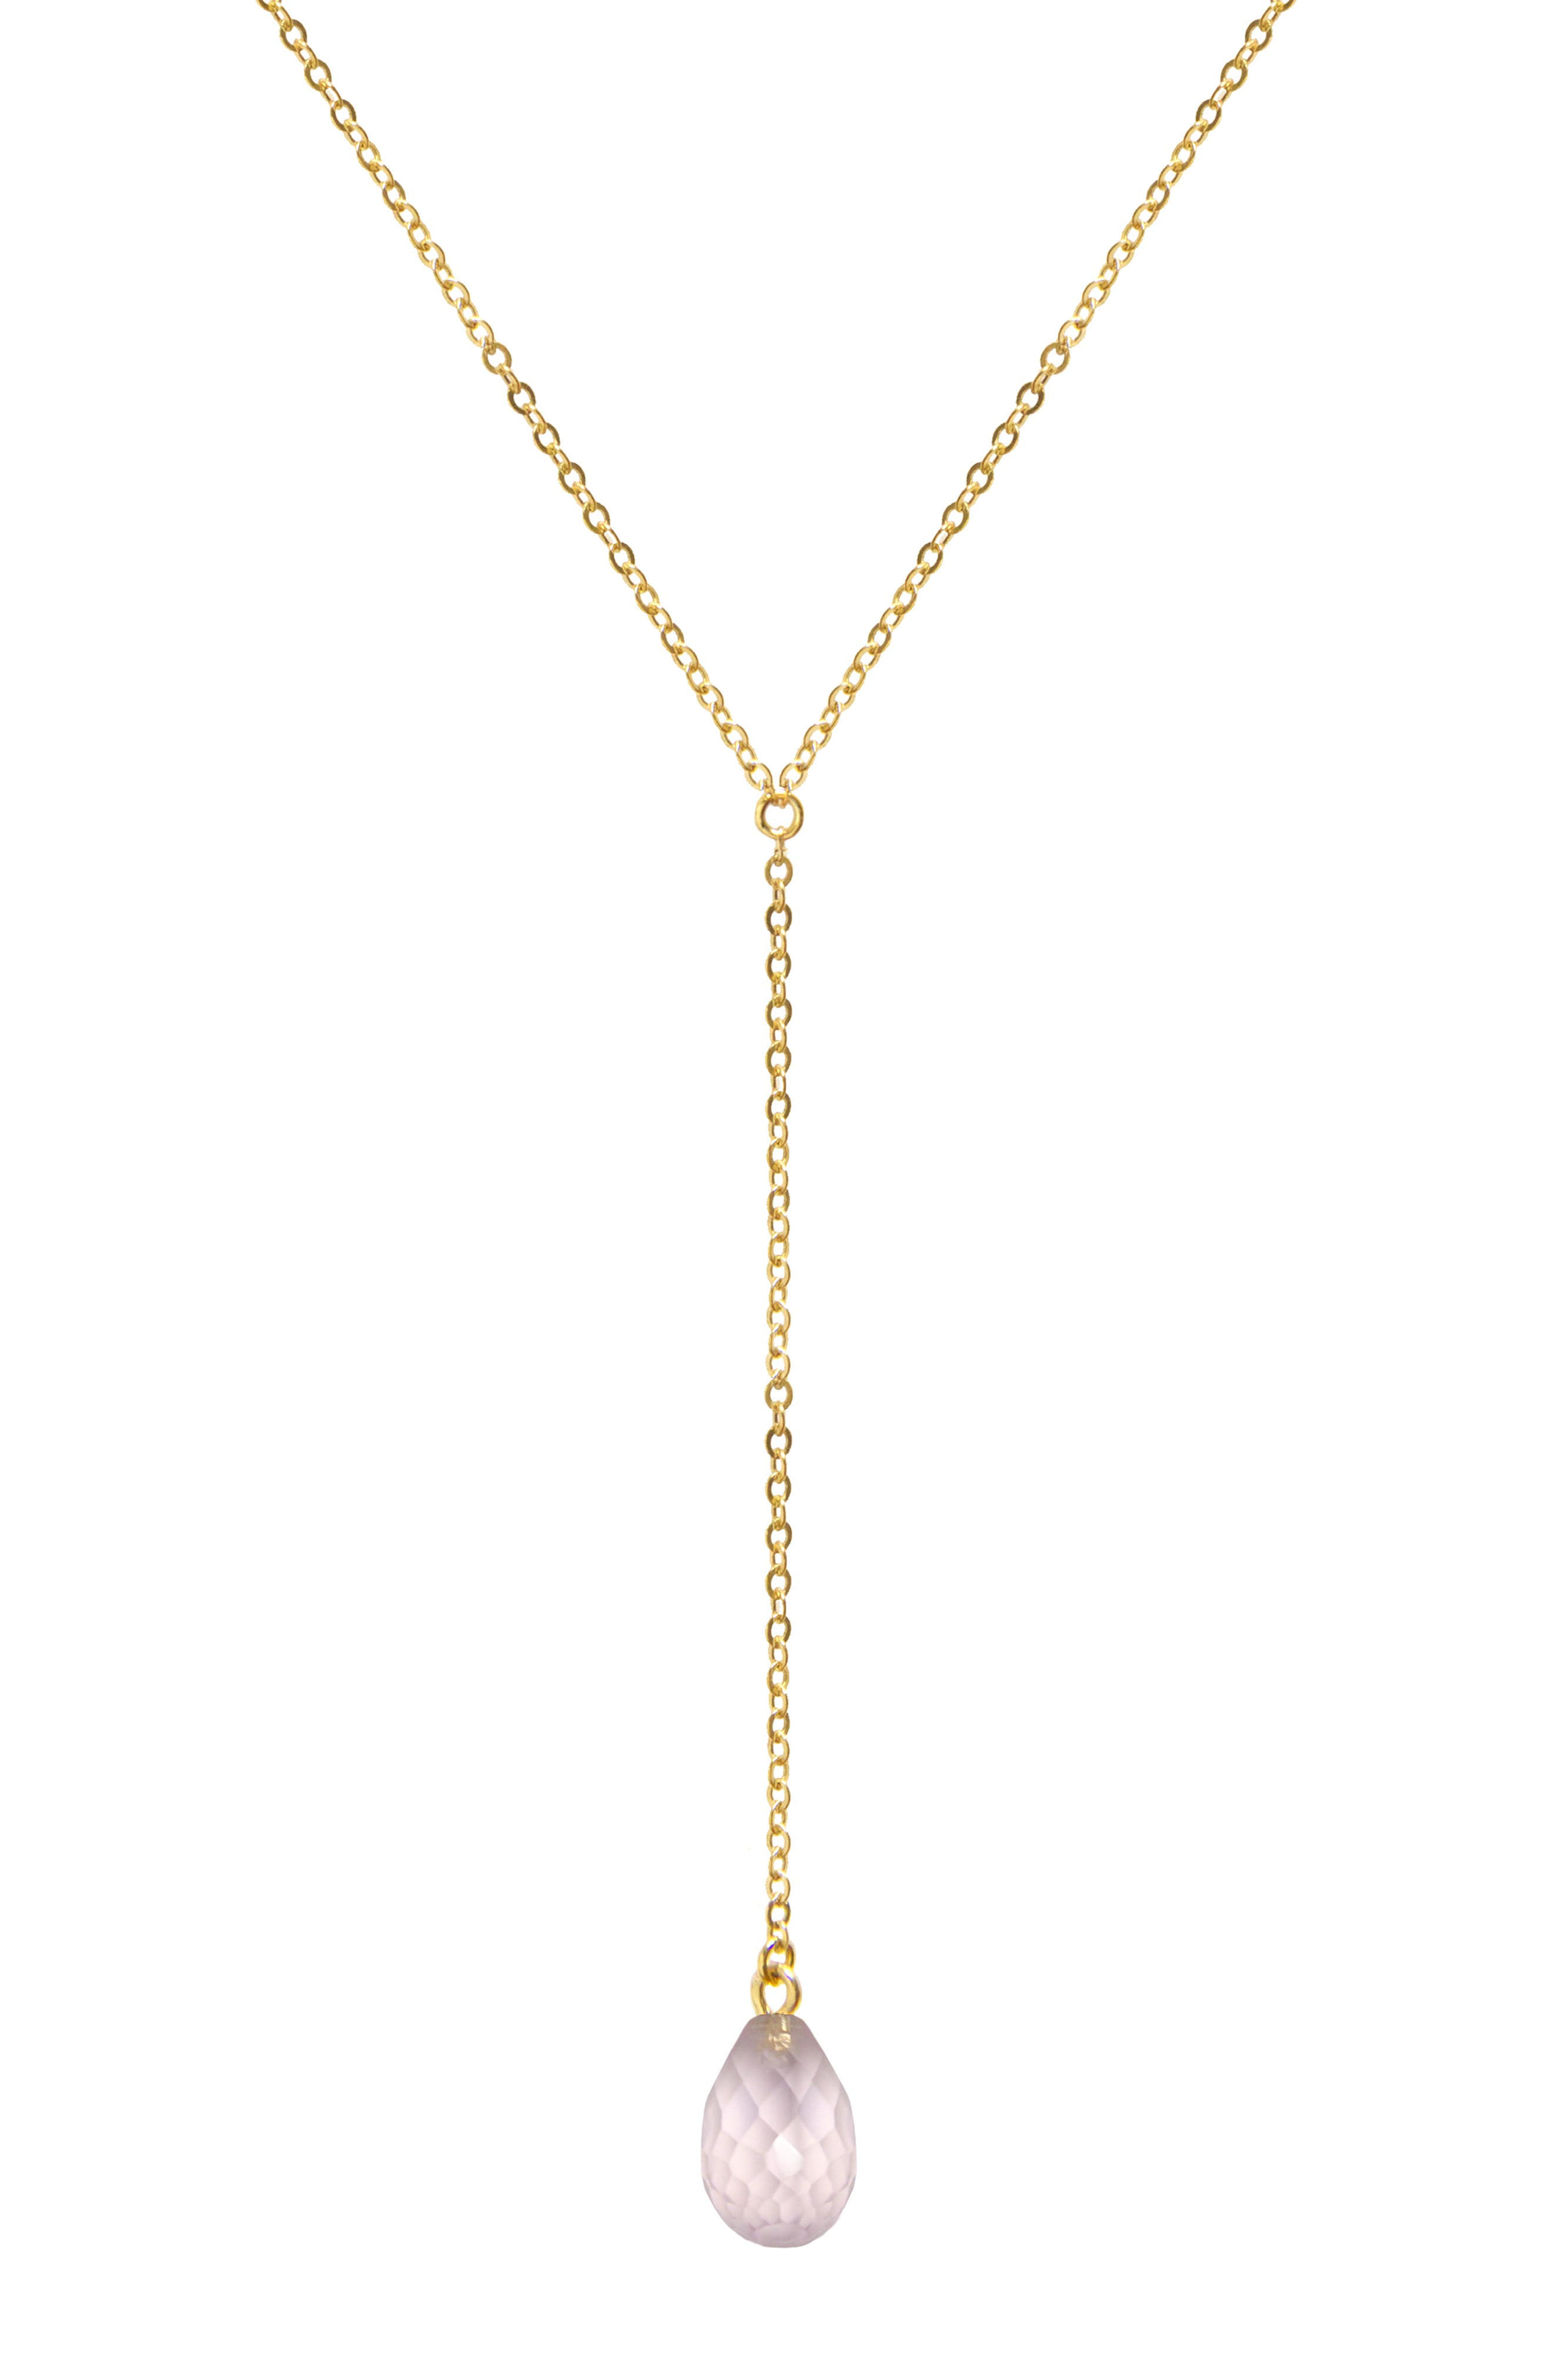 Briolette Gemstone Y-Necklace